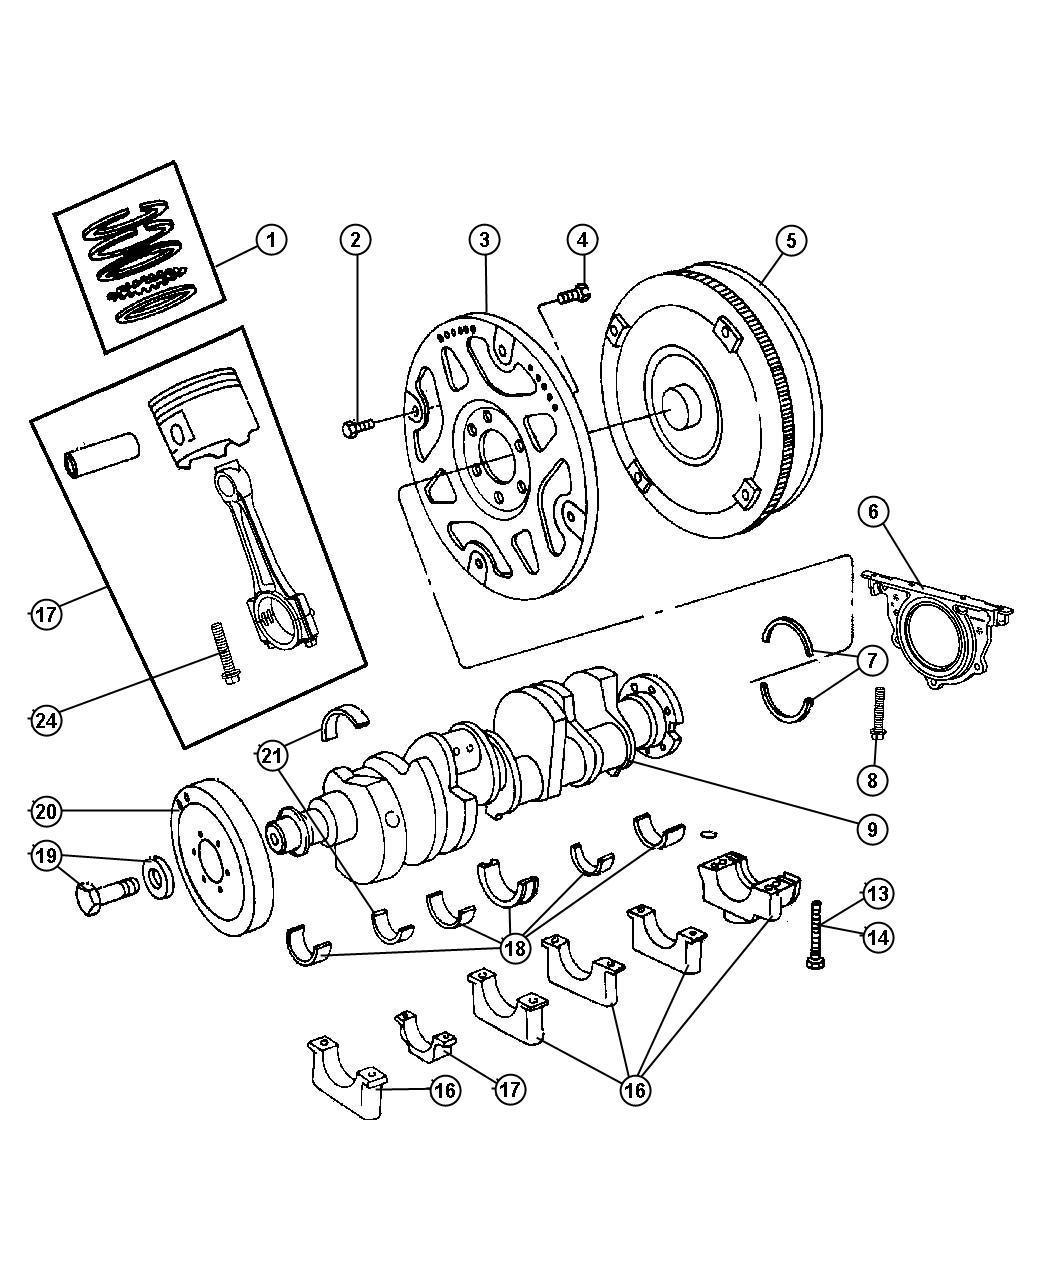 Dodge Ram Crankshaft Engine Hemi Torque